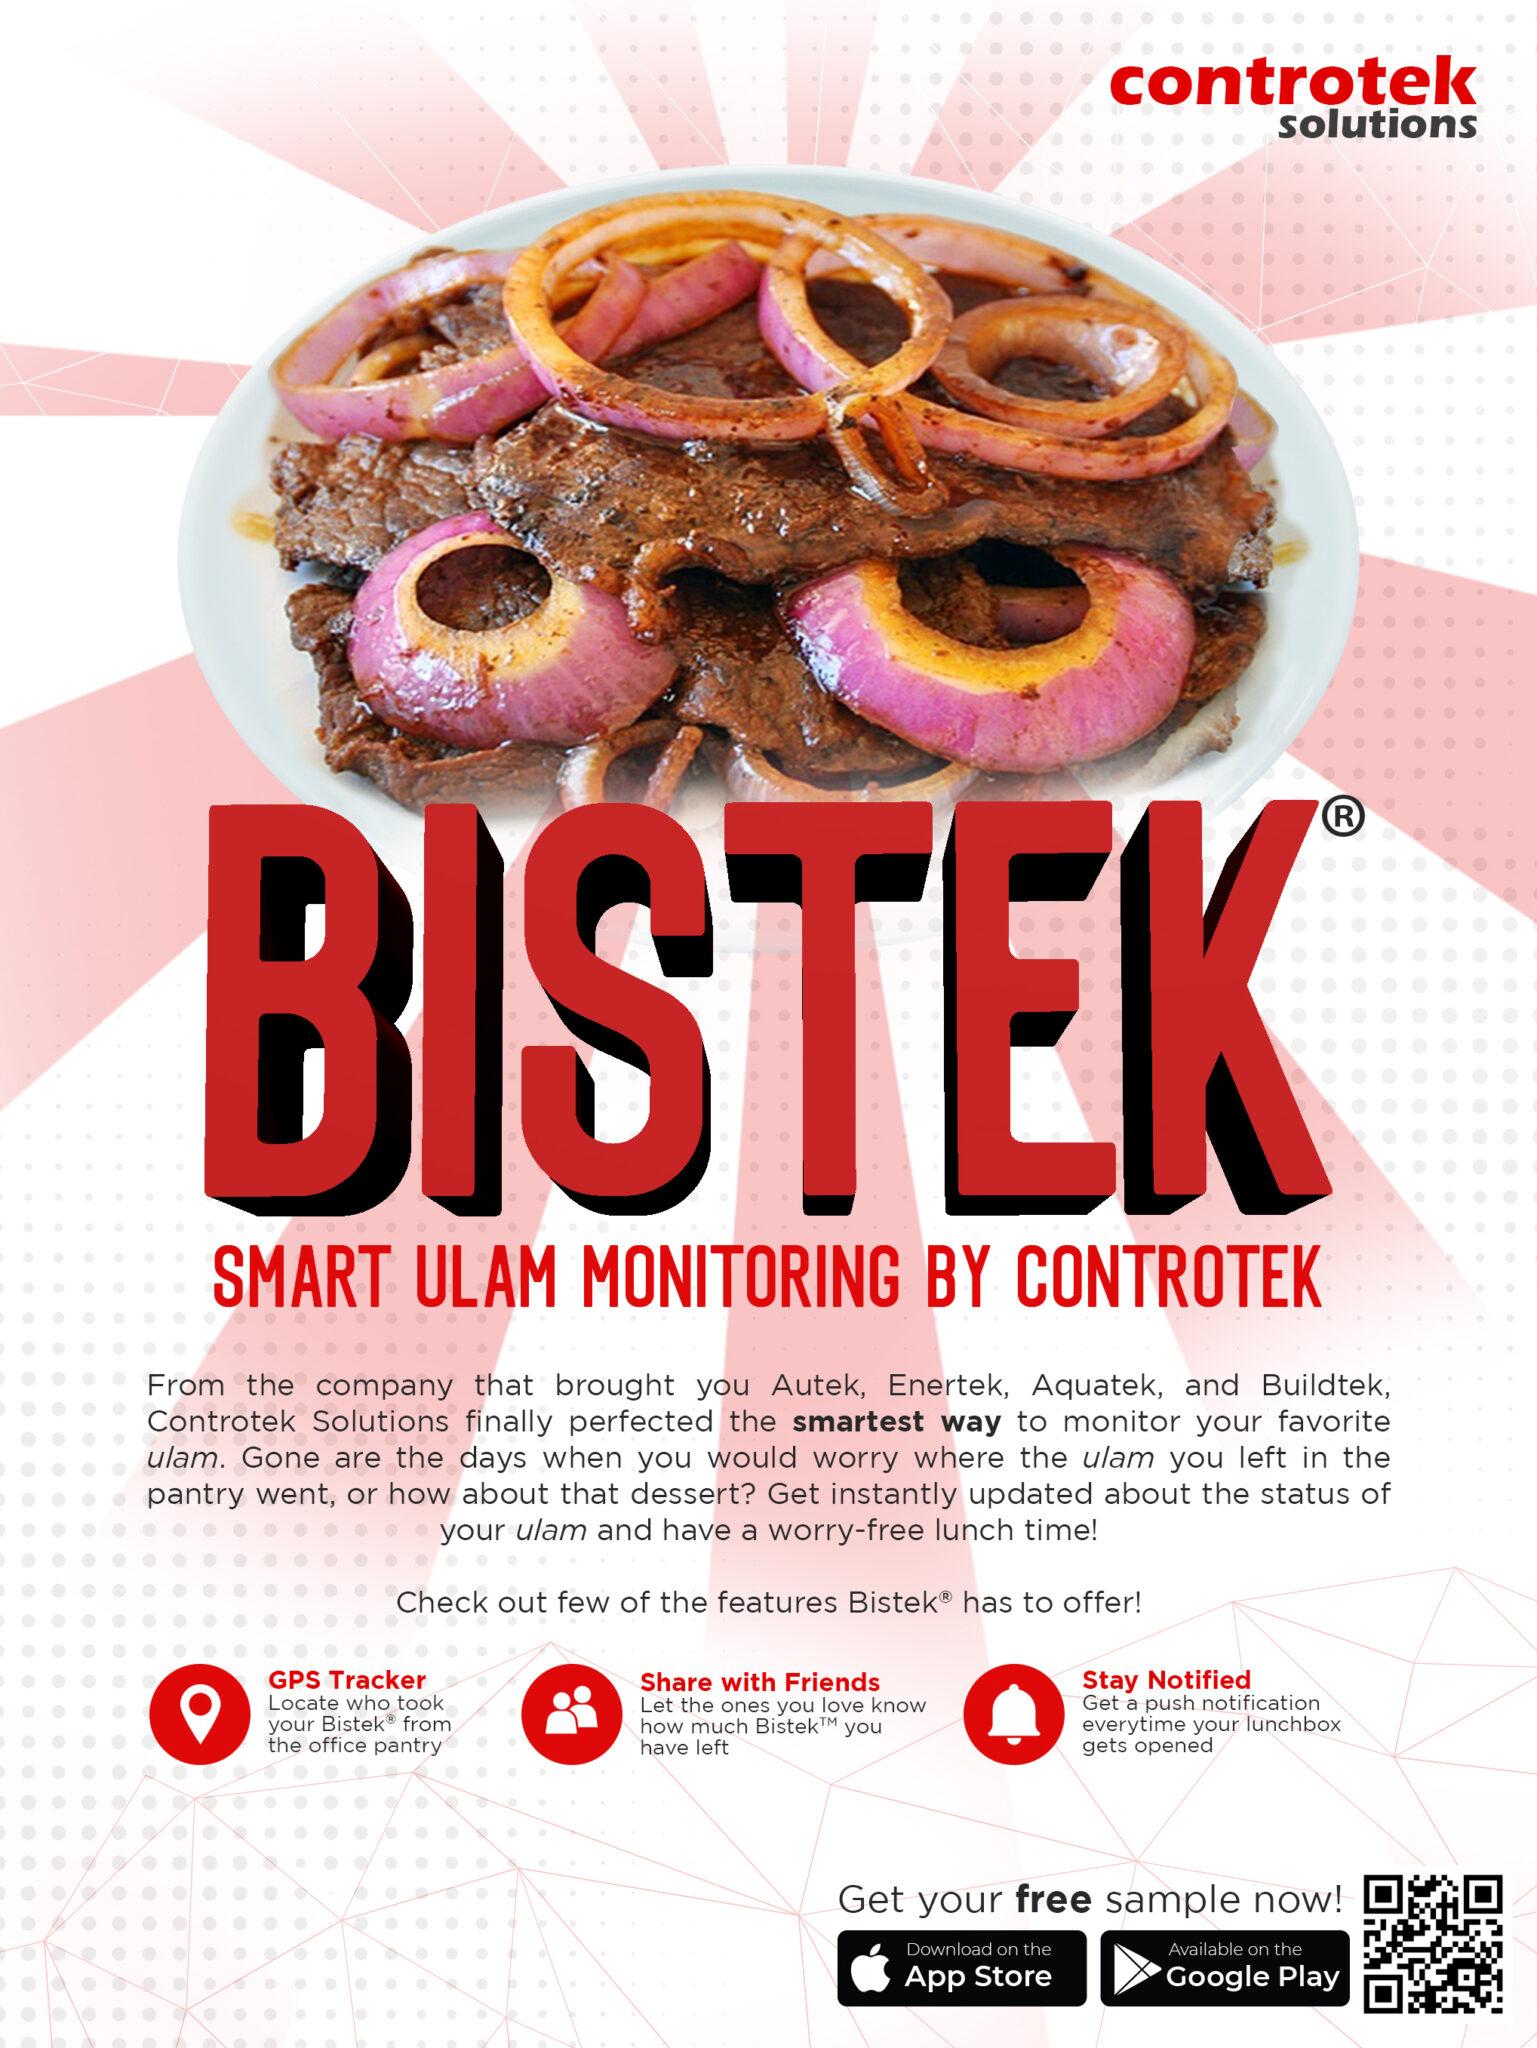 Bistek® - Smart Ulam Monitoring by Controtek